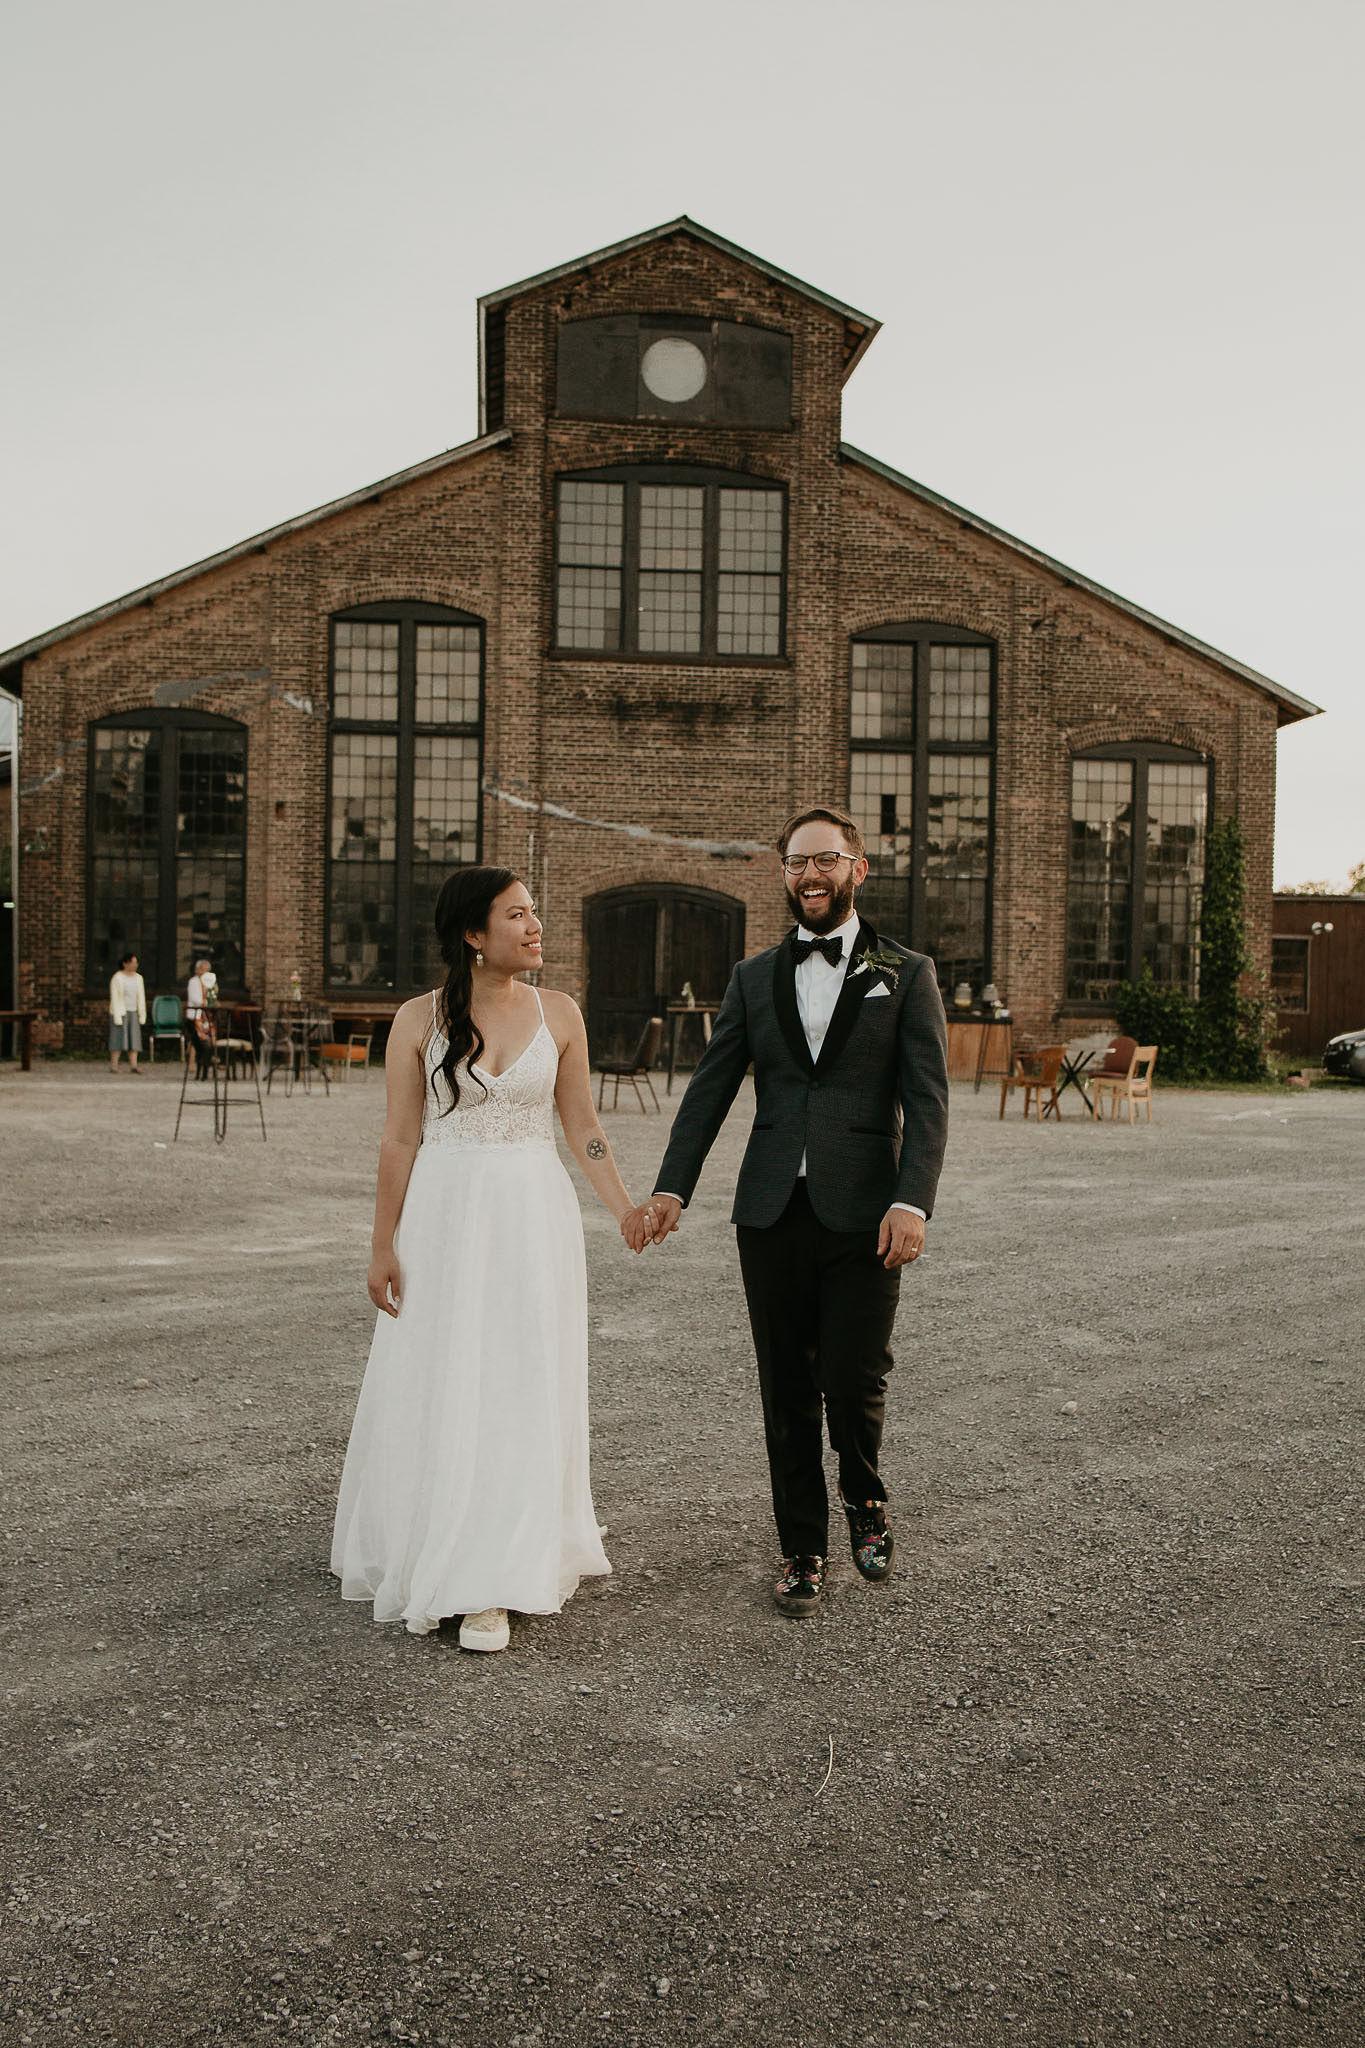 Jess+Matt_wedding-388.JPG